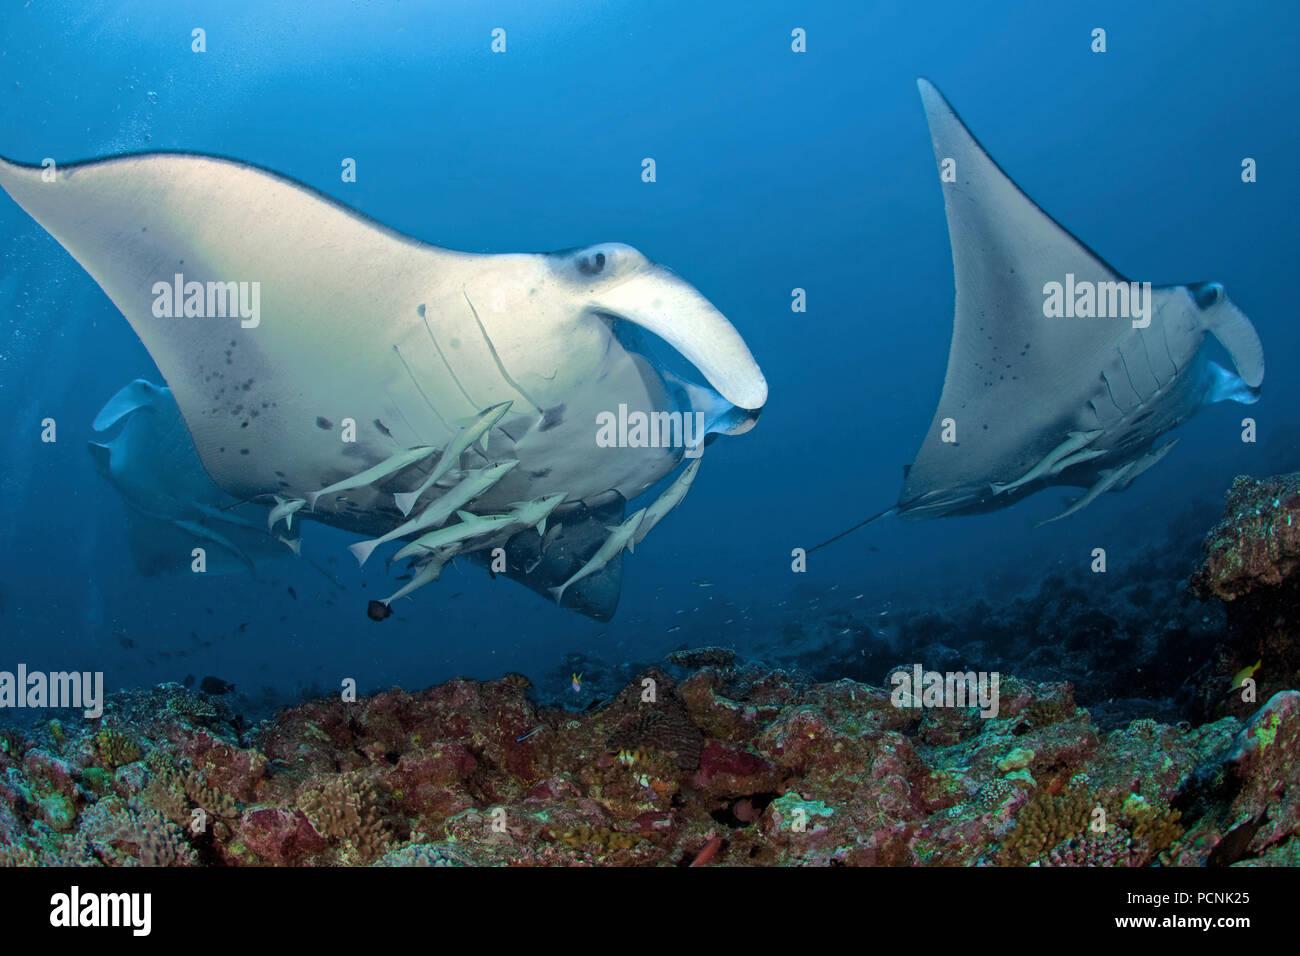 Two Giant oceanic manta rays (Manta birostris) with shark suckers (Remora remora), Yap, Micronesia Stock Photo